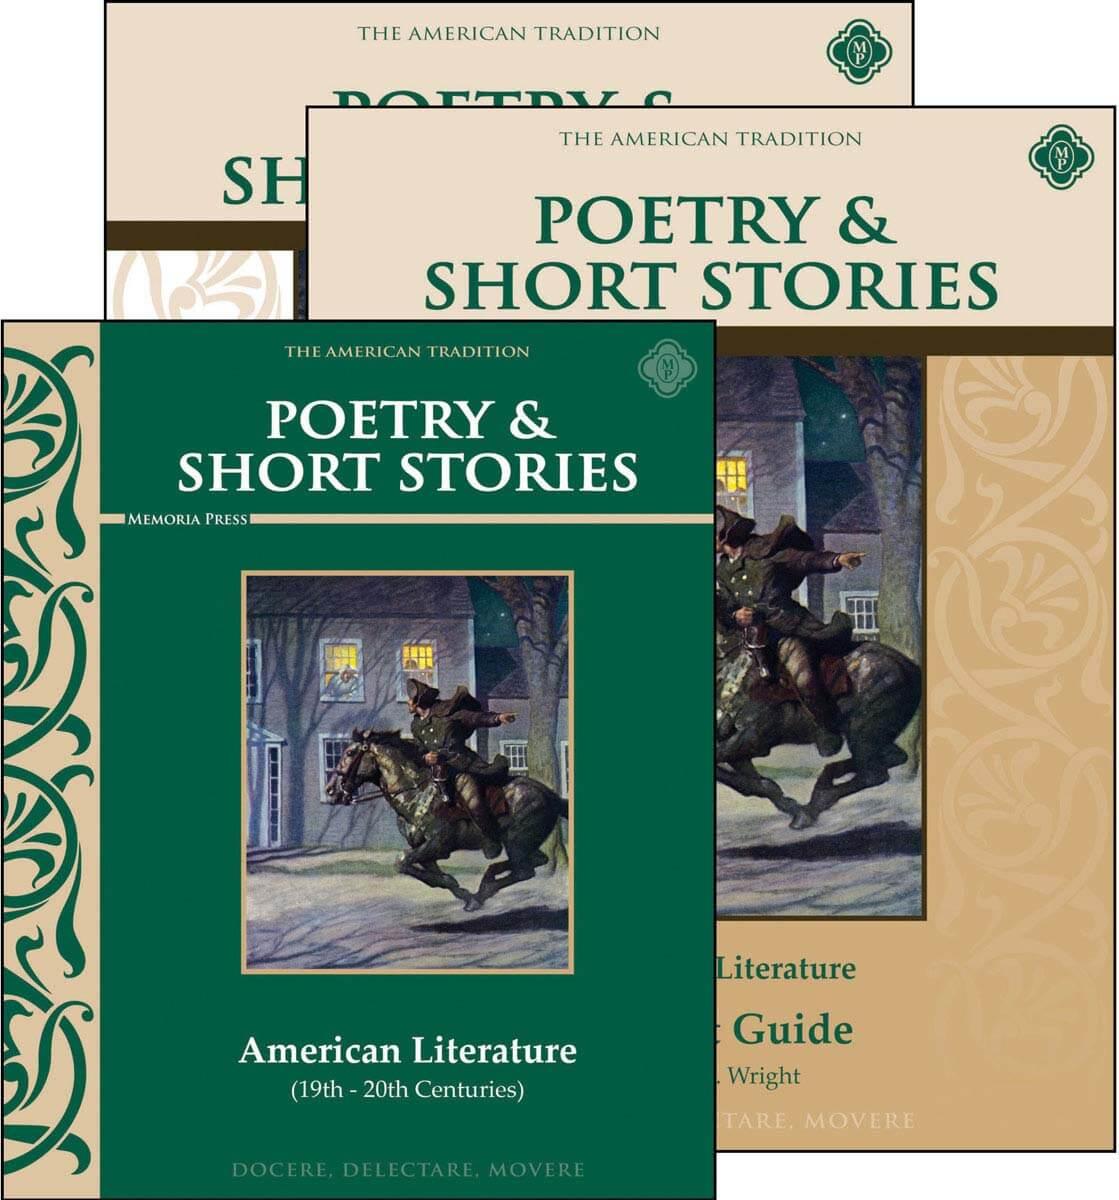 Worksheets American Literature Worksheets poetry short stories american literature set memoria press set